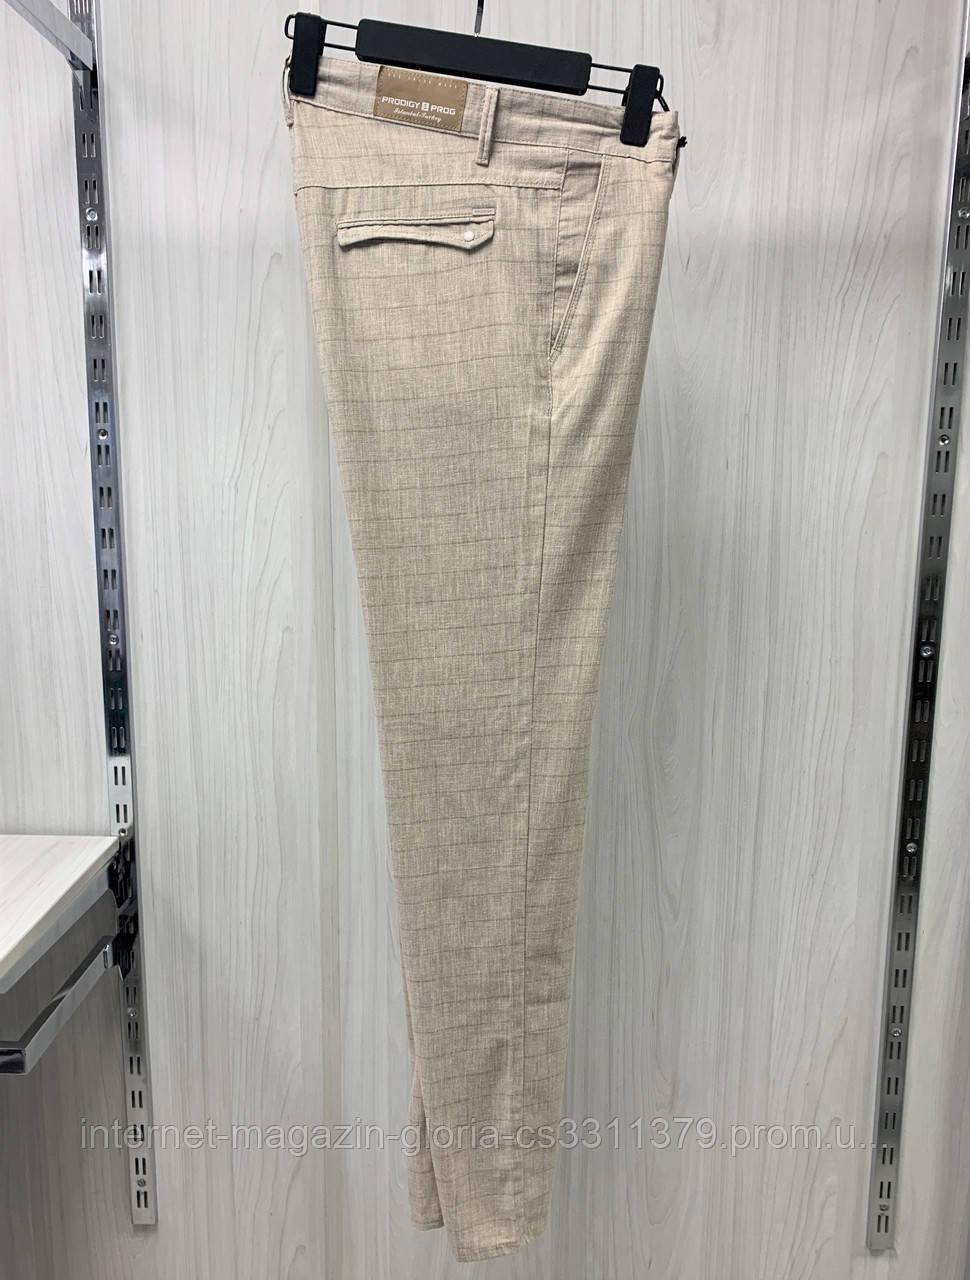 Мужские брюки Prodigy. Лён. (Linen 2054). Размеры: 31,32,33,34,36,38,40.